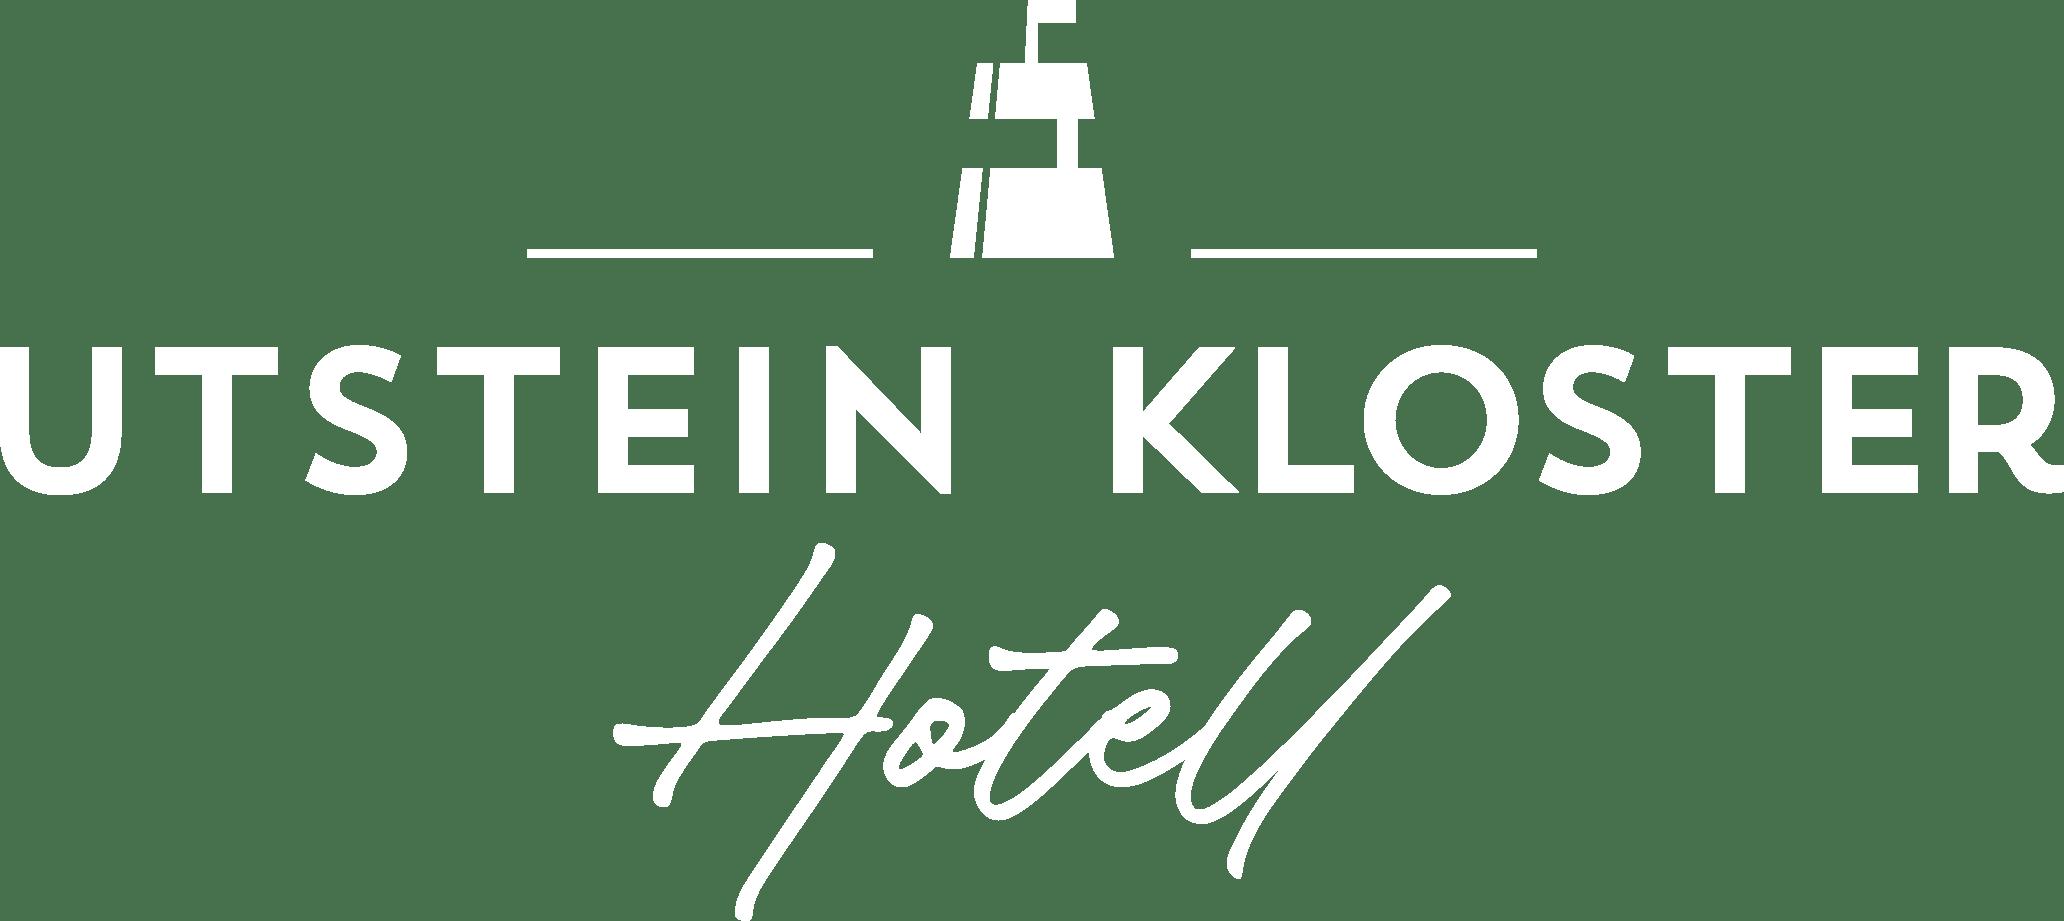 Utstein Kloster Hotell